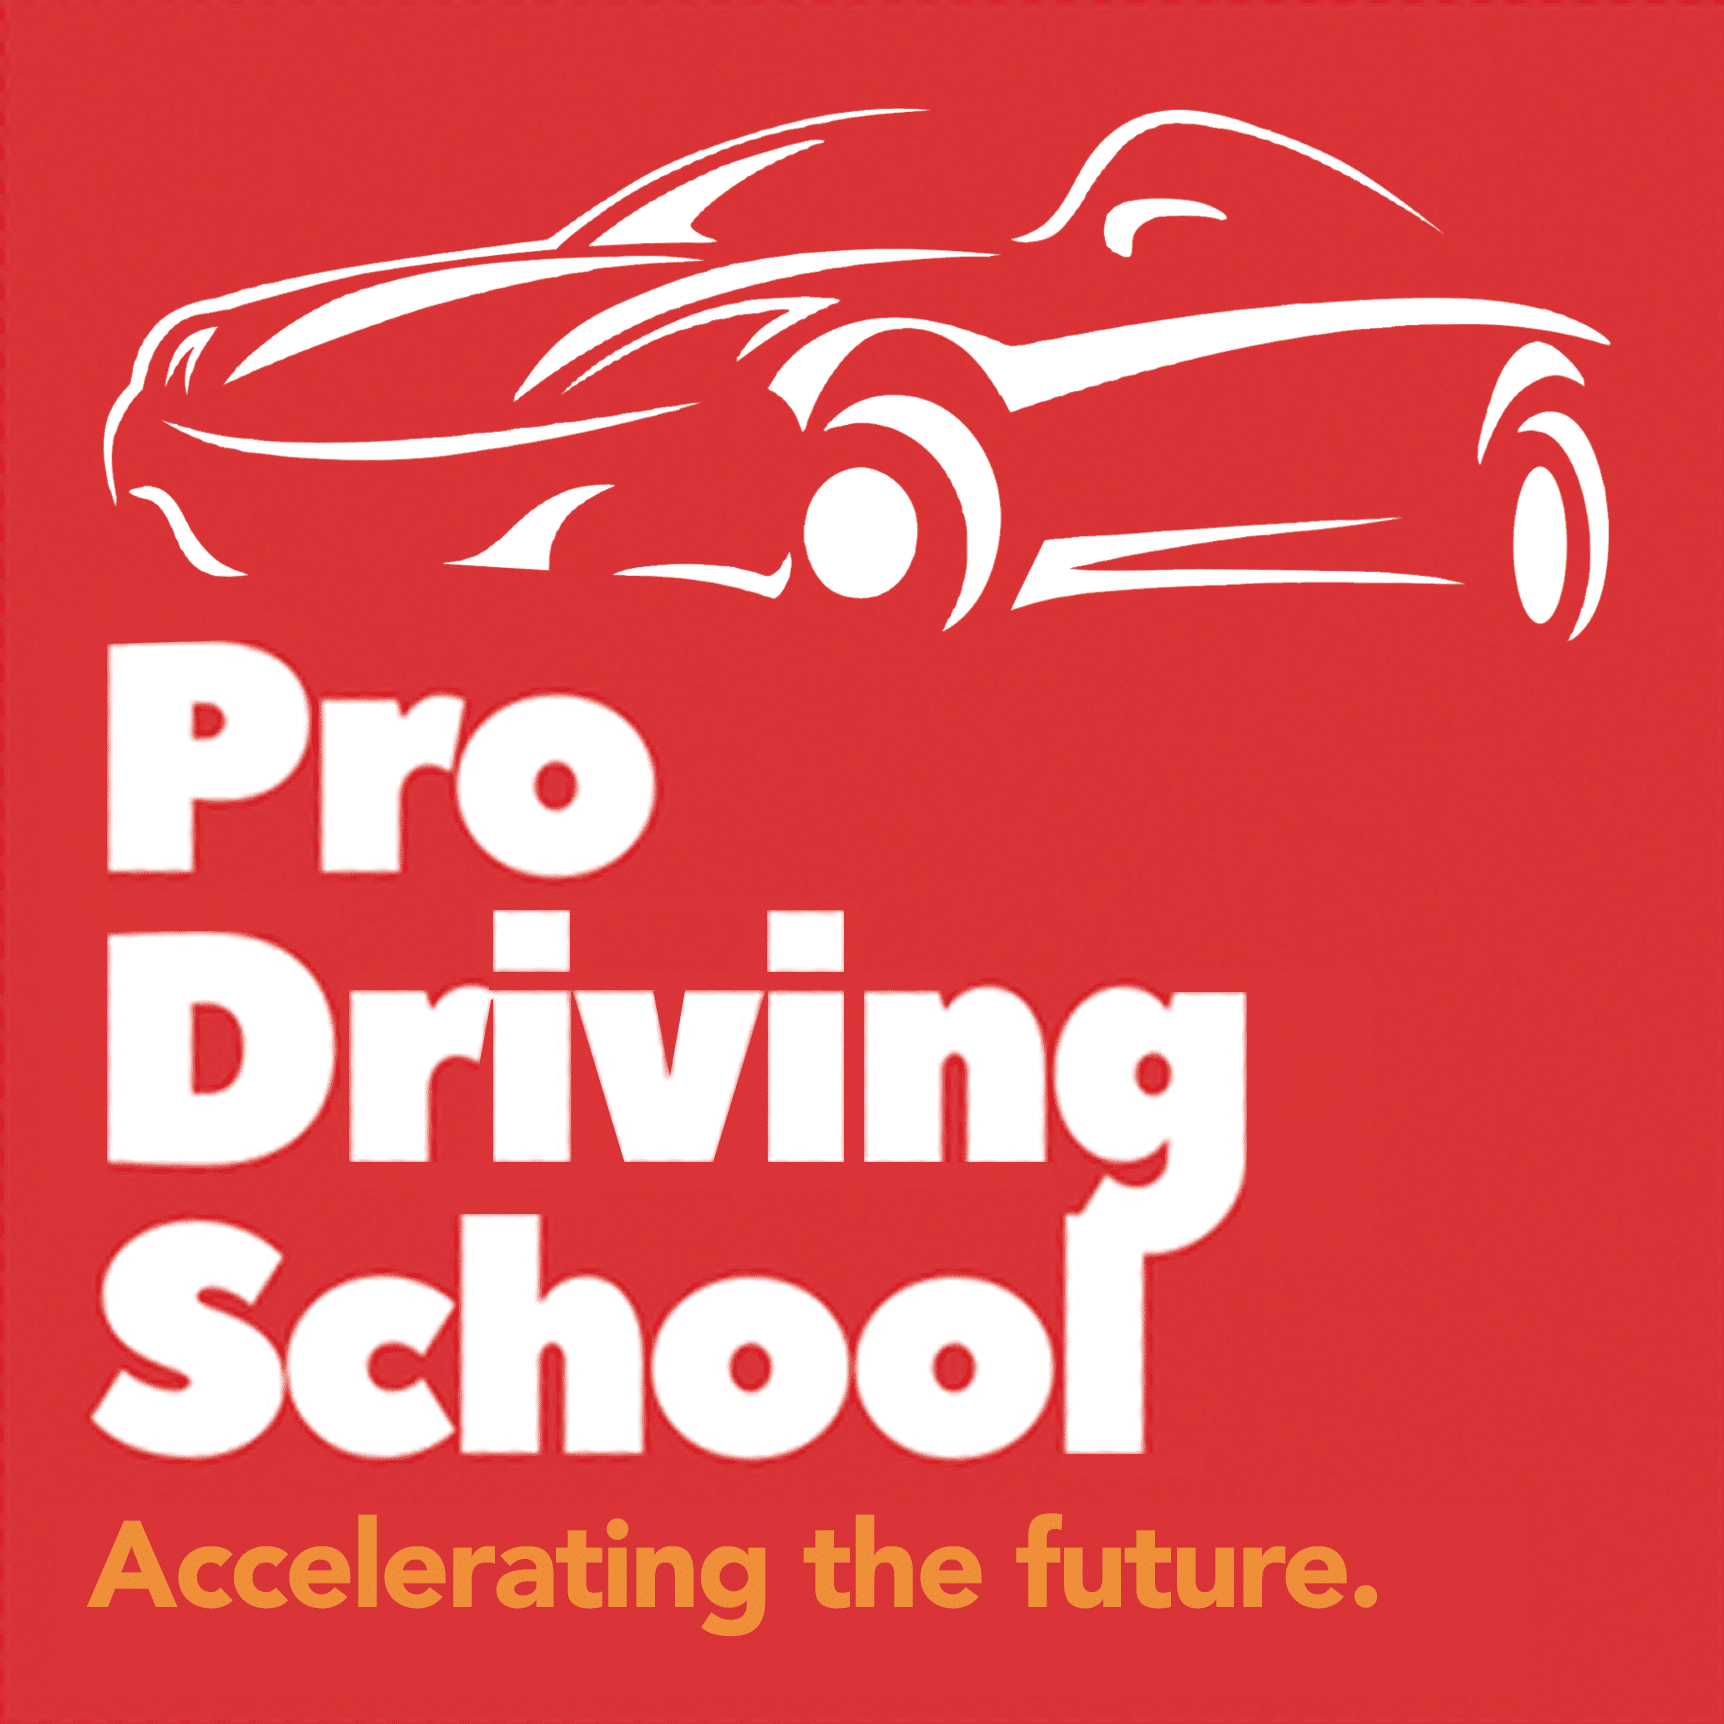 Pro Driving School